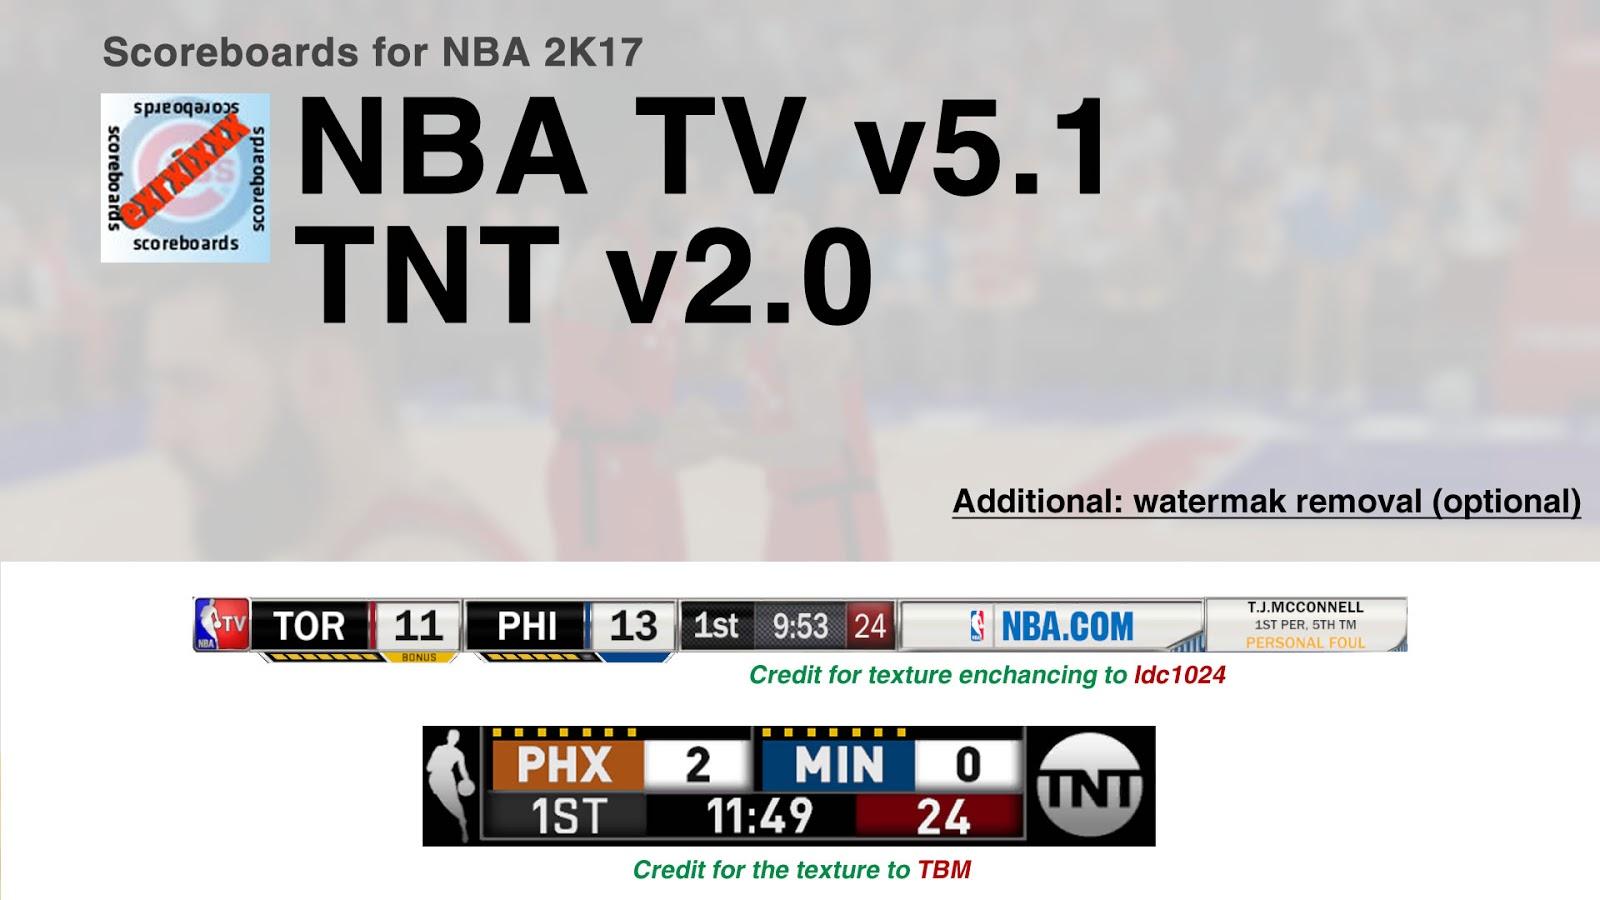 nba tv 5 1 tnt 2 0 scoreboards tnt update by exrxixxx. Black Bedroom Furniture Sets. Home Design Ideas